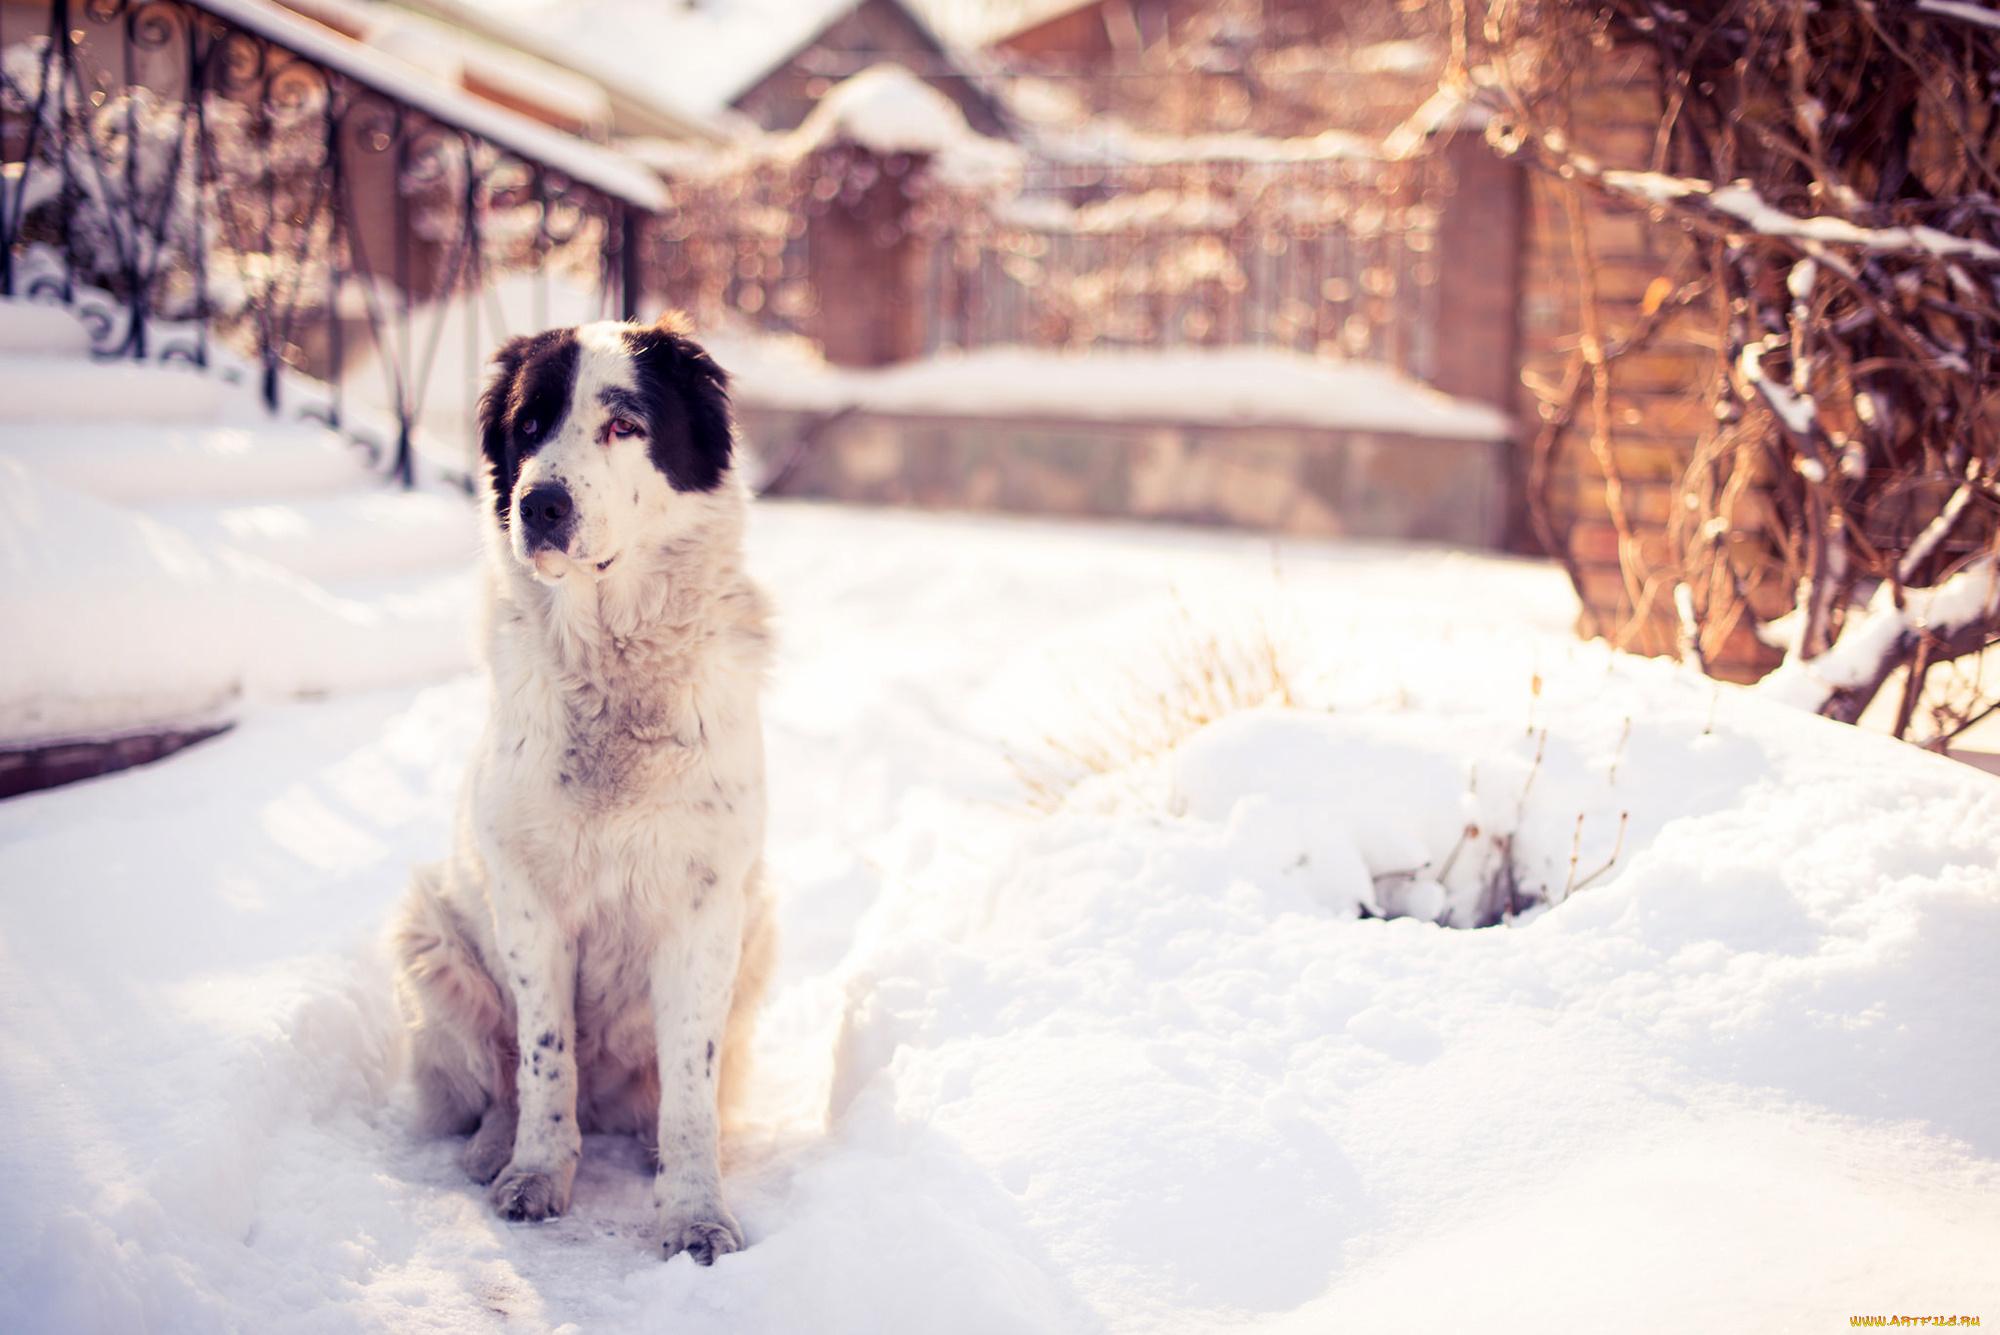 щенок снег puppy snow  № 2001790 бесплатно